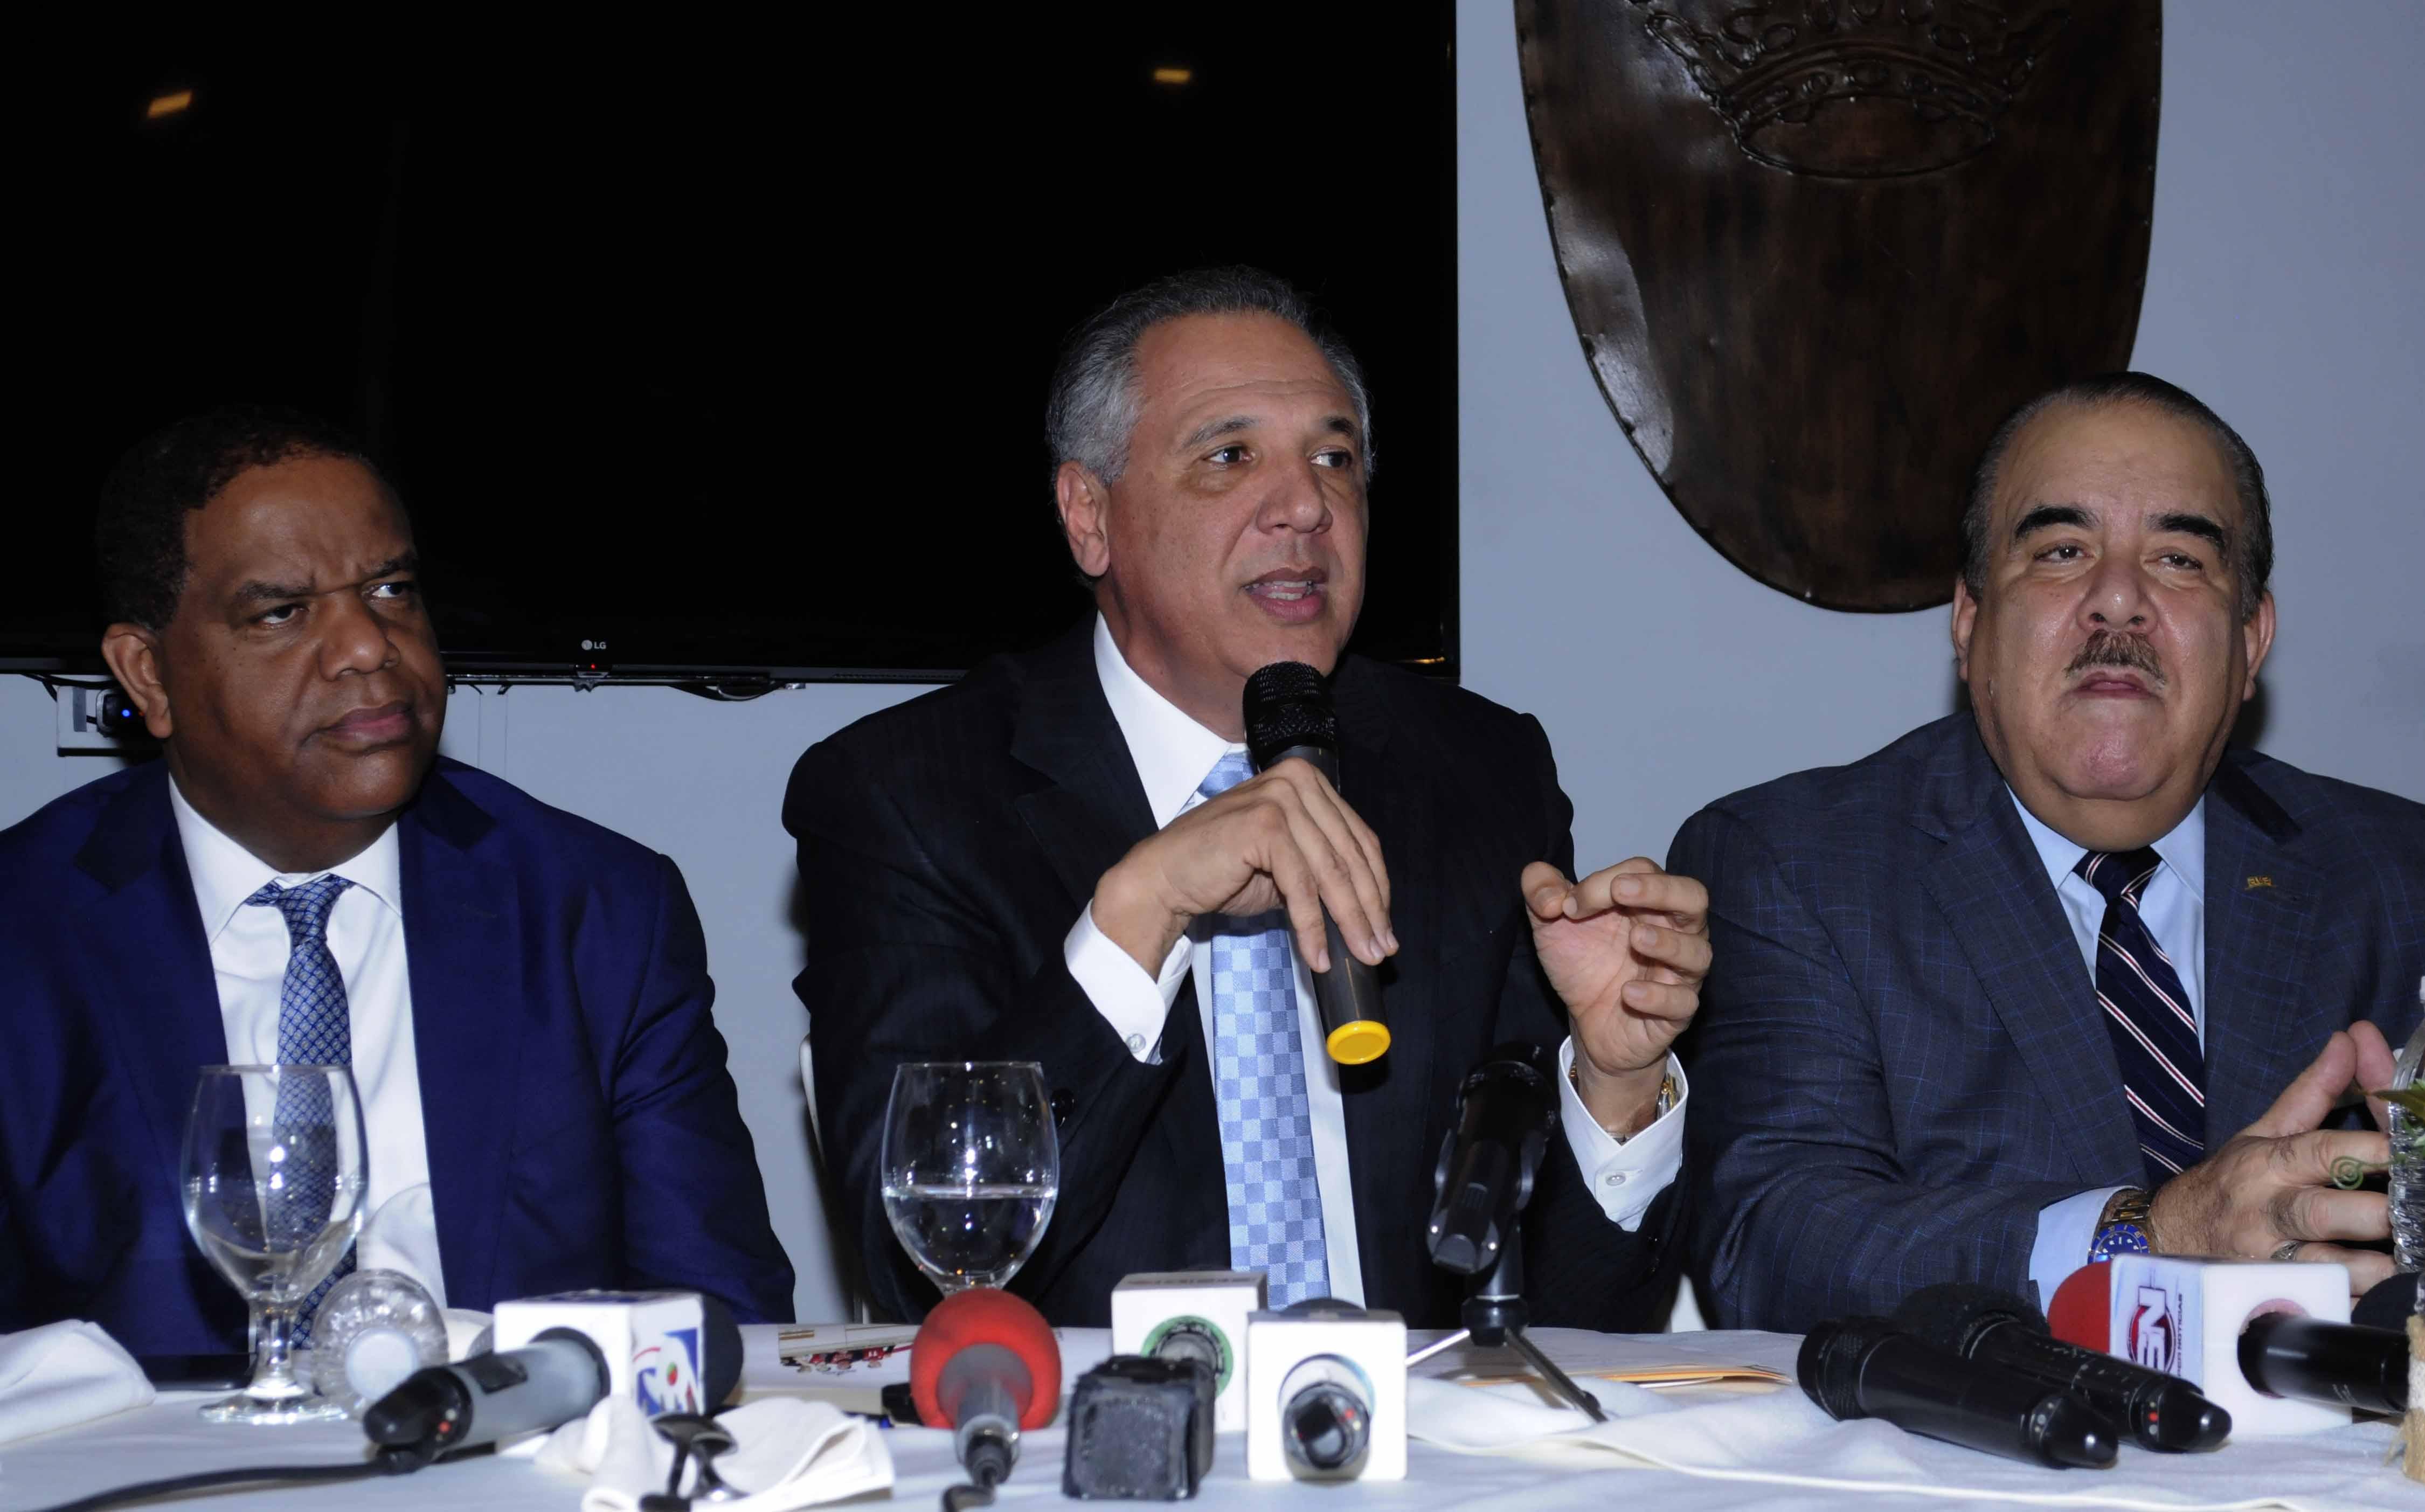 Según José Ramón Peralta, República Dominicana vivirá espectáculo mundialista